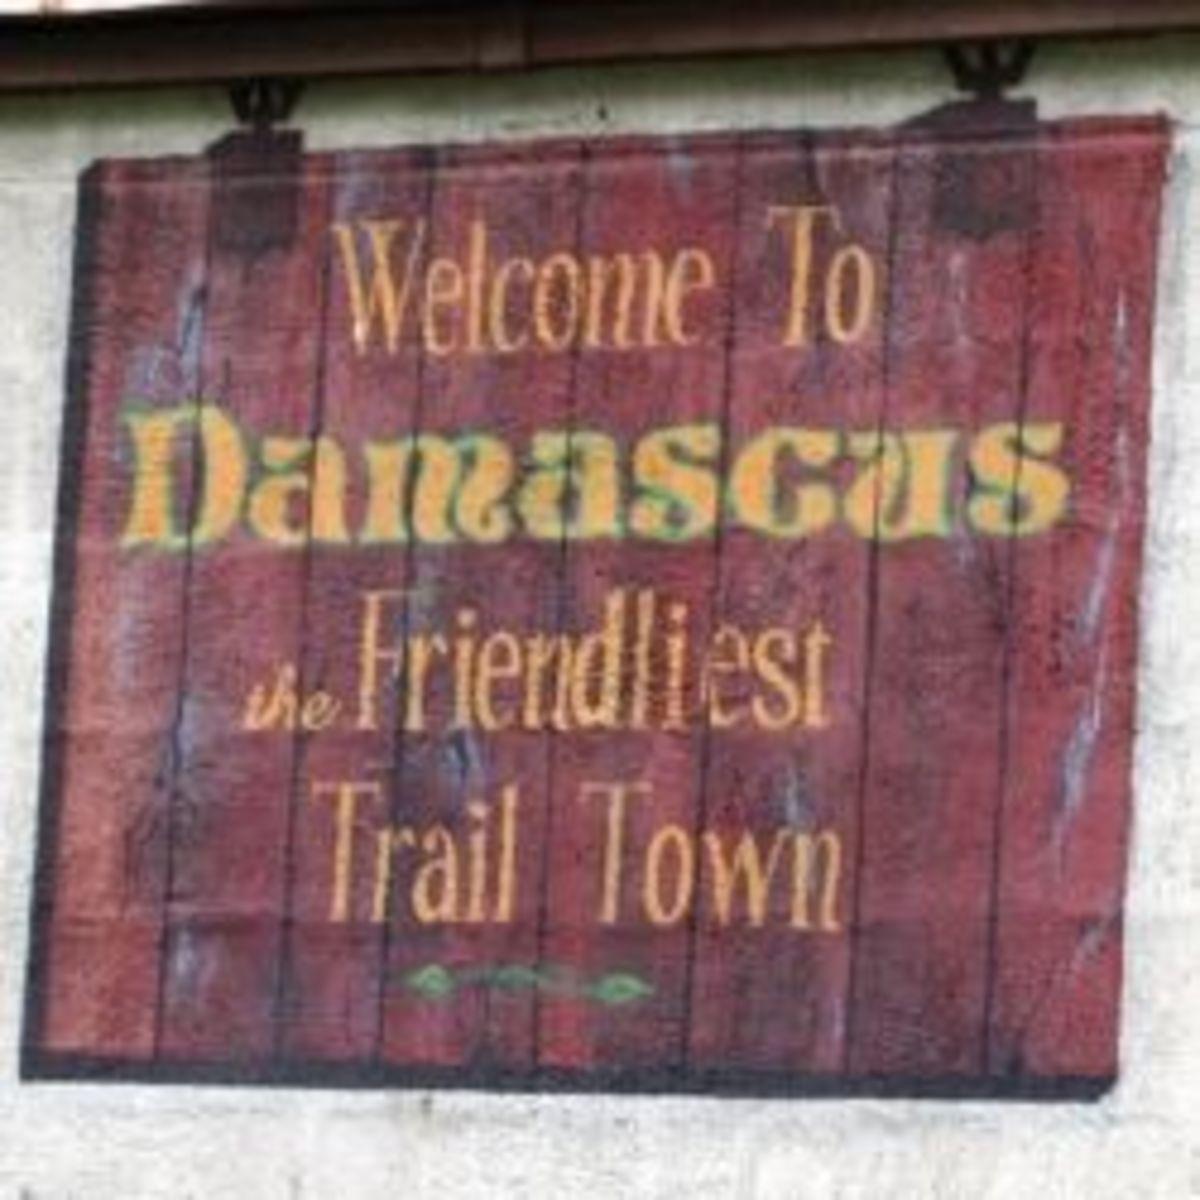 Damascus--The Friendliest Town on the Appalachian Trail